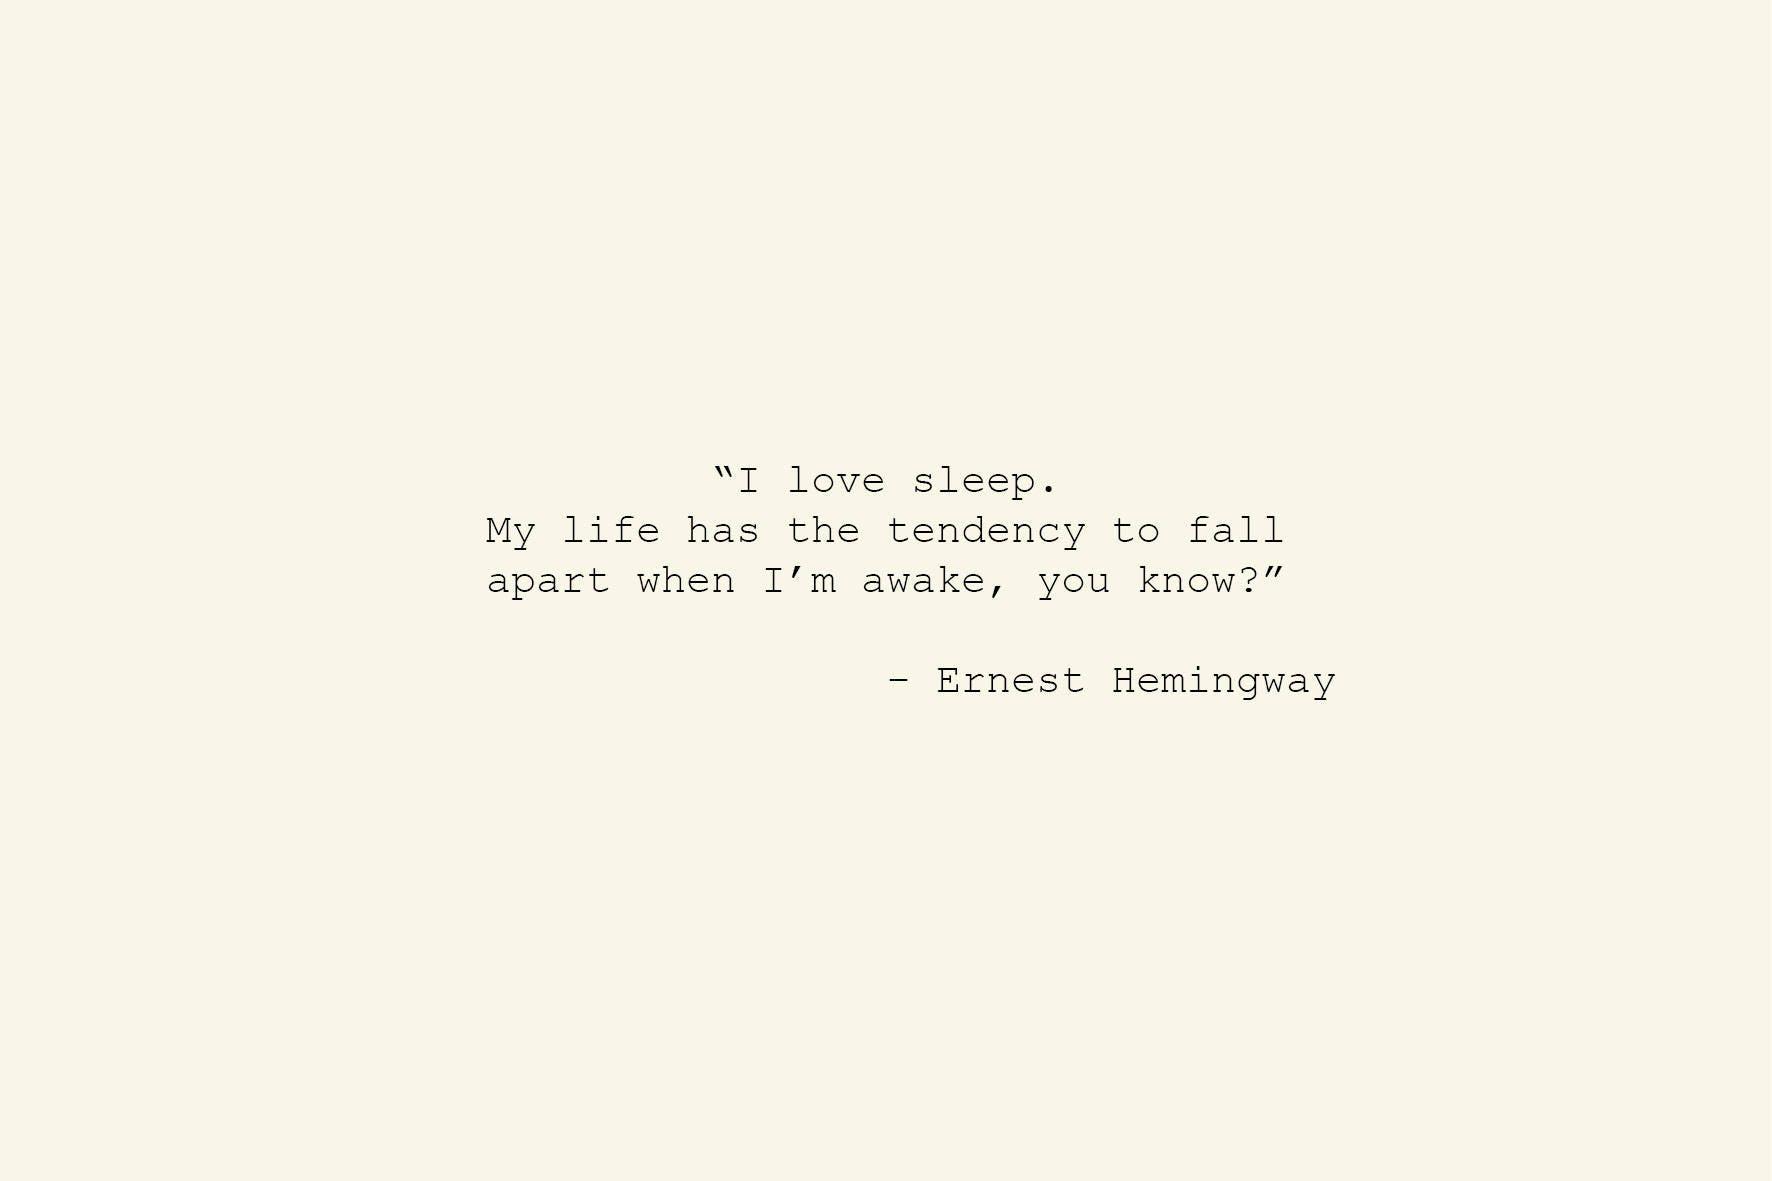 Hemingway Quotes On Love Ernest Hemingway Quote I Love Sleep.typewriter